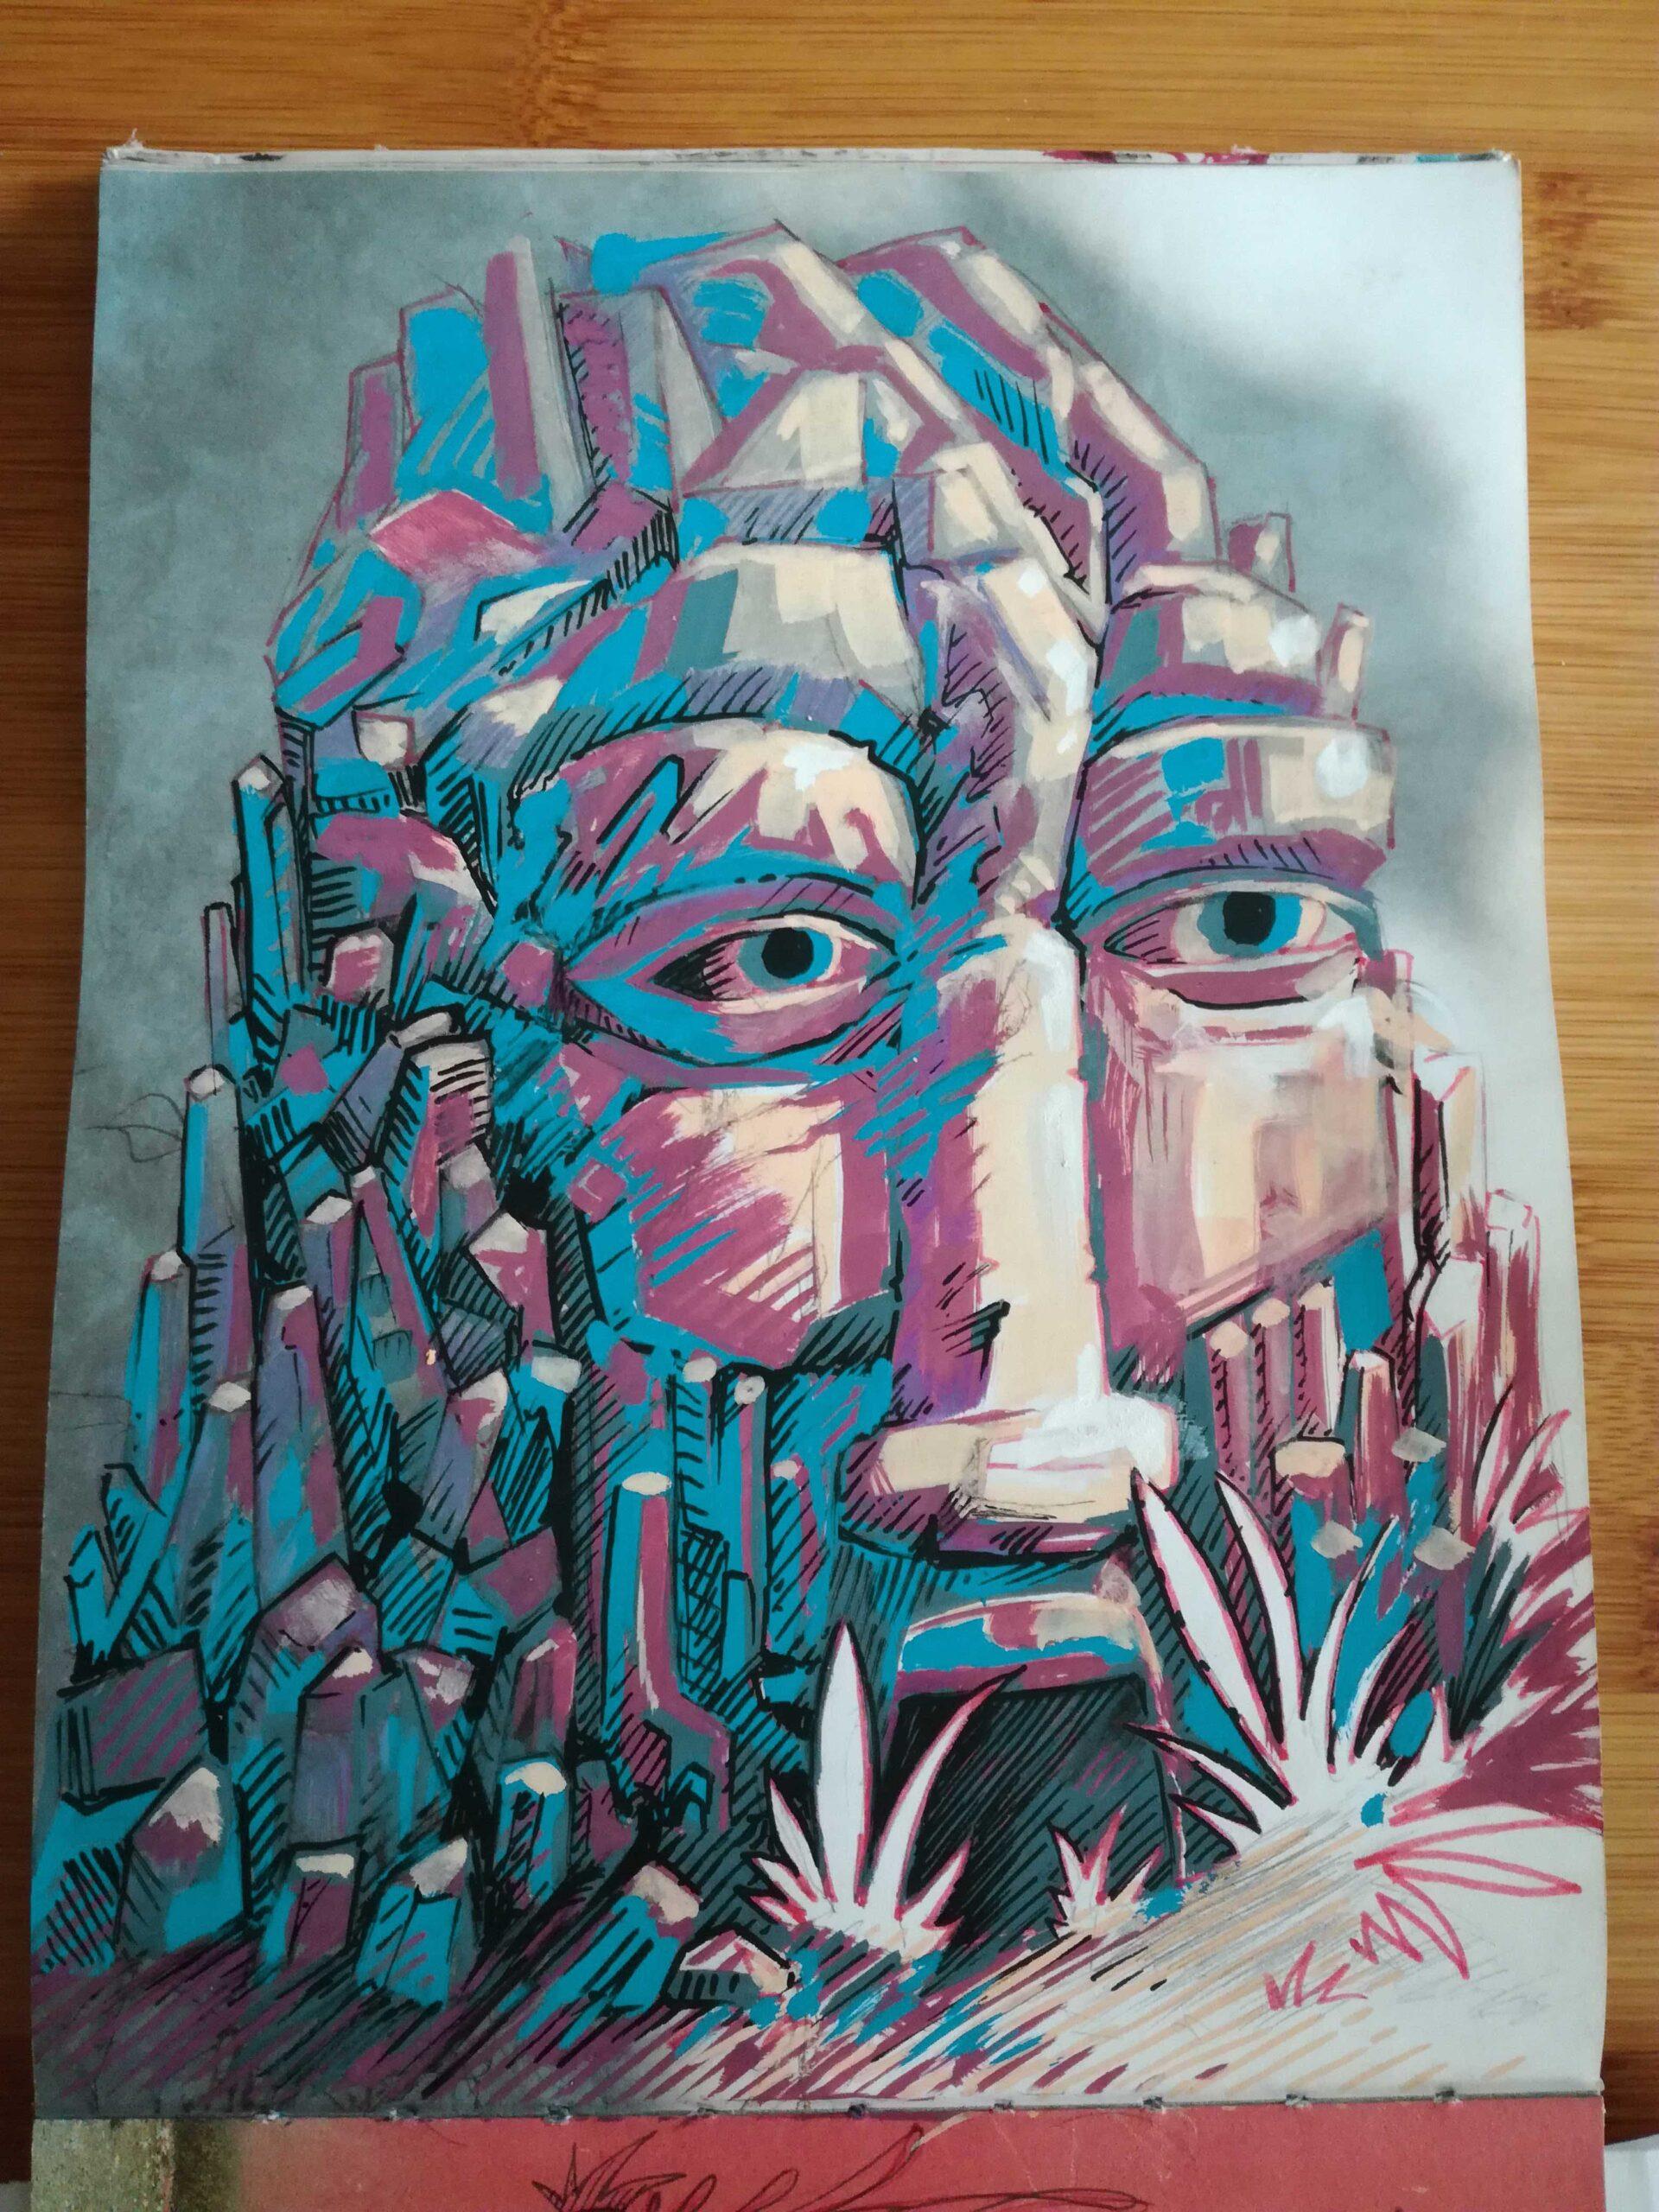 stone spirit - illustration abys2fly lyon